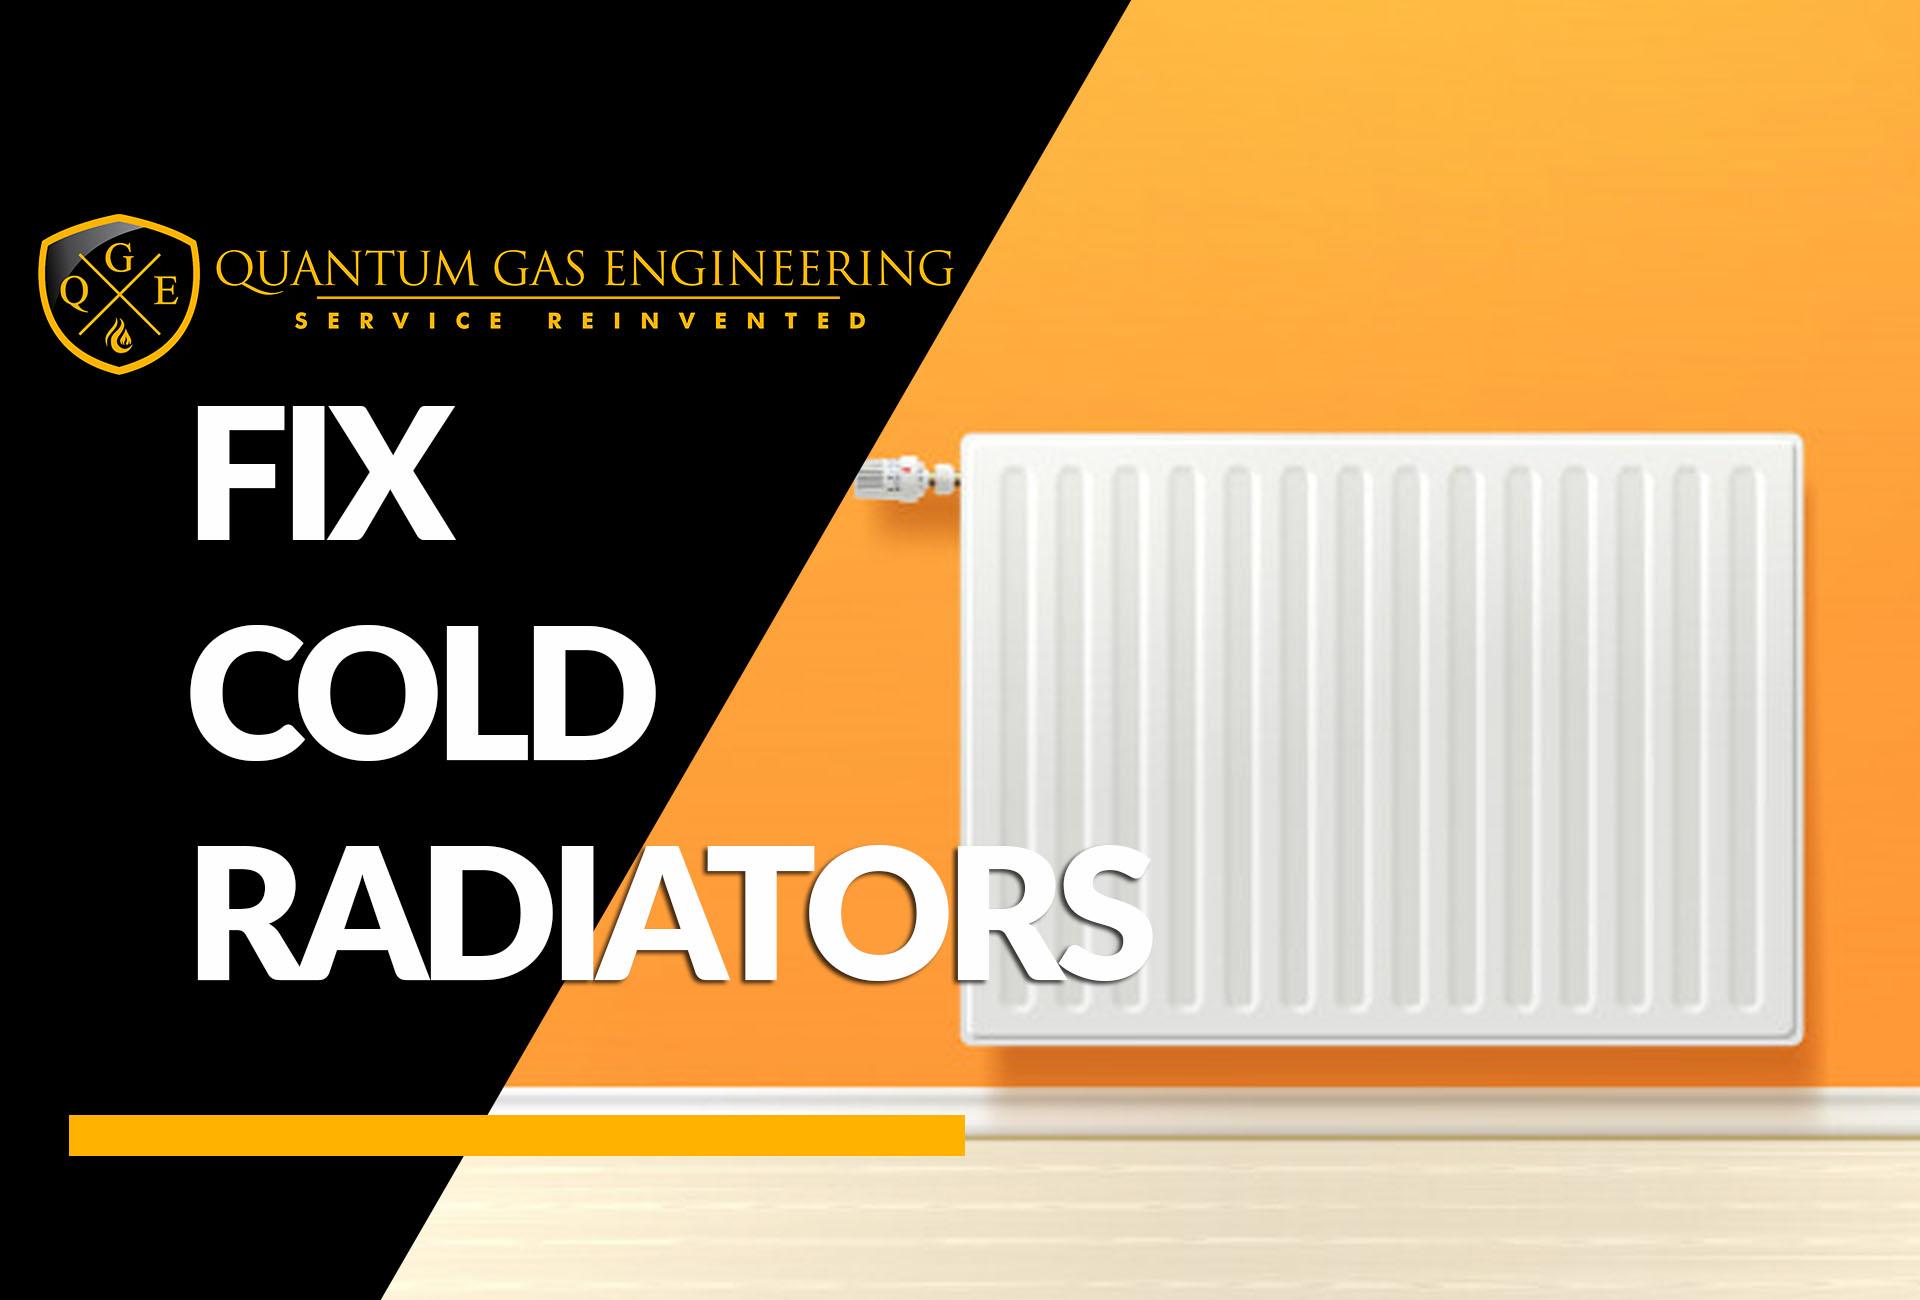 fix cold radiators